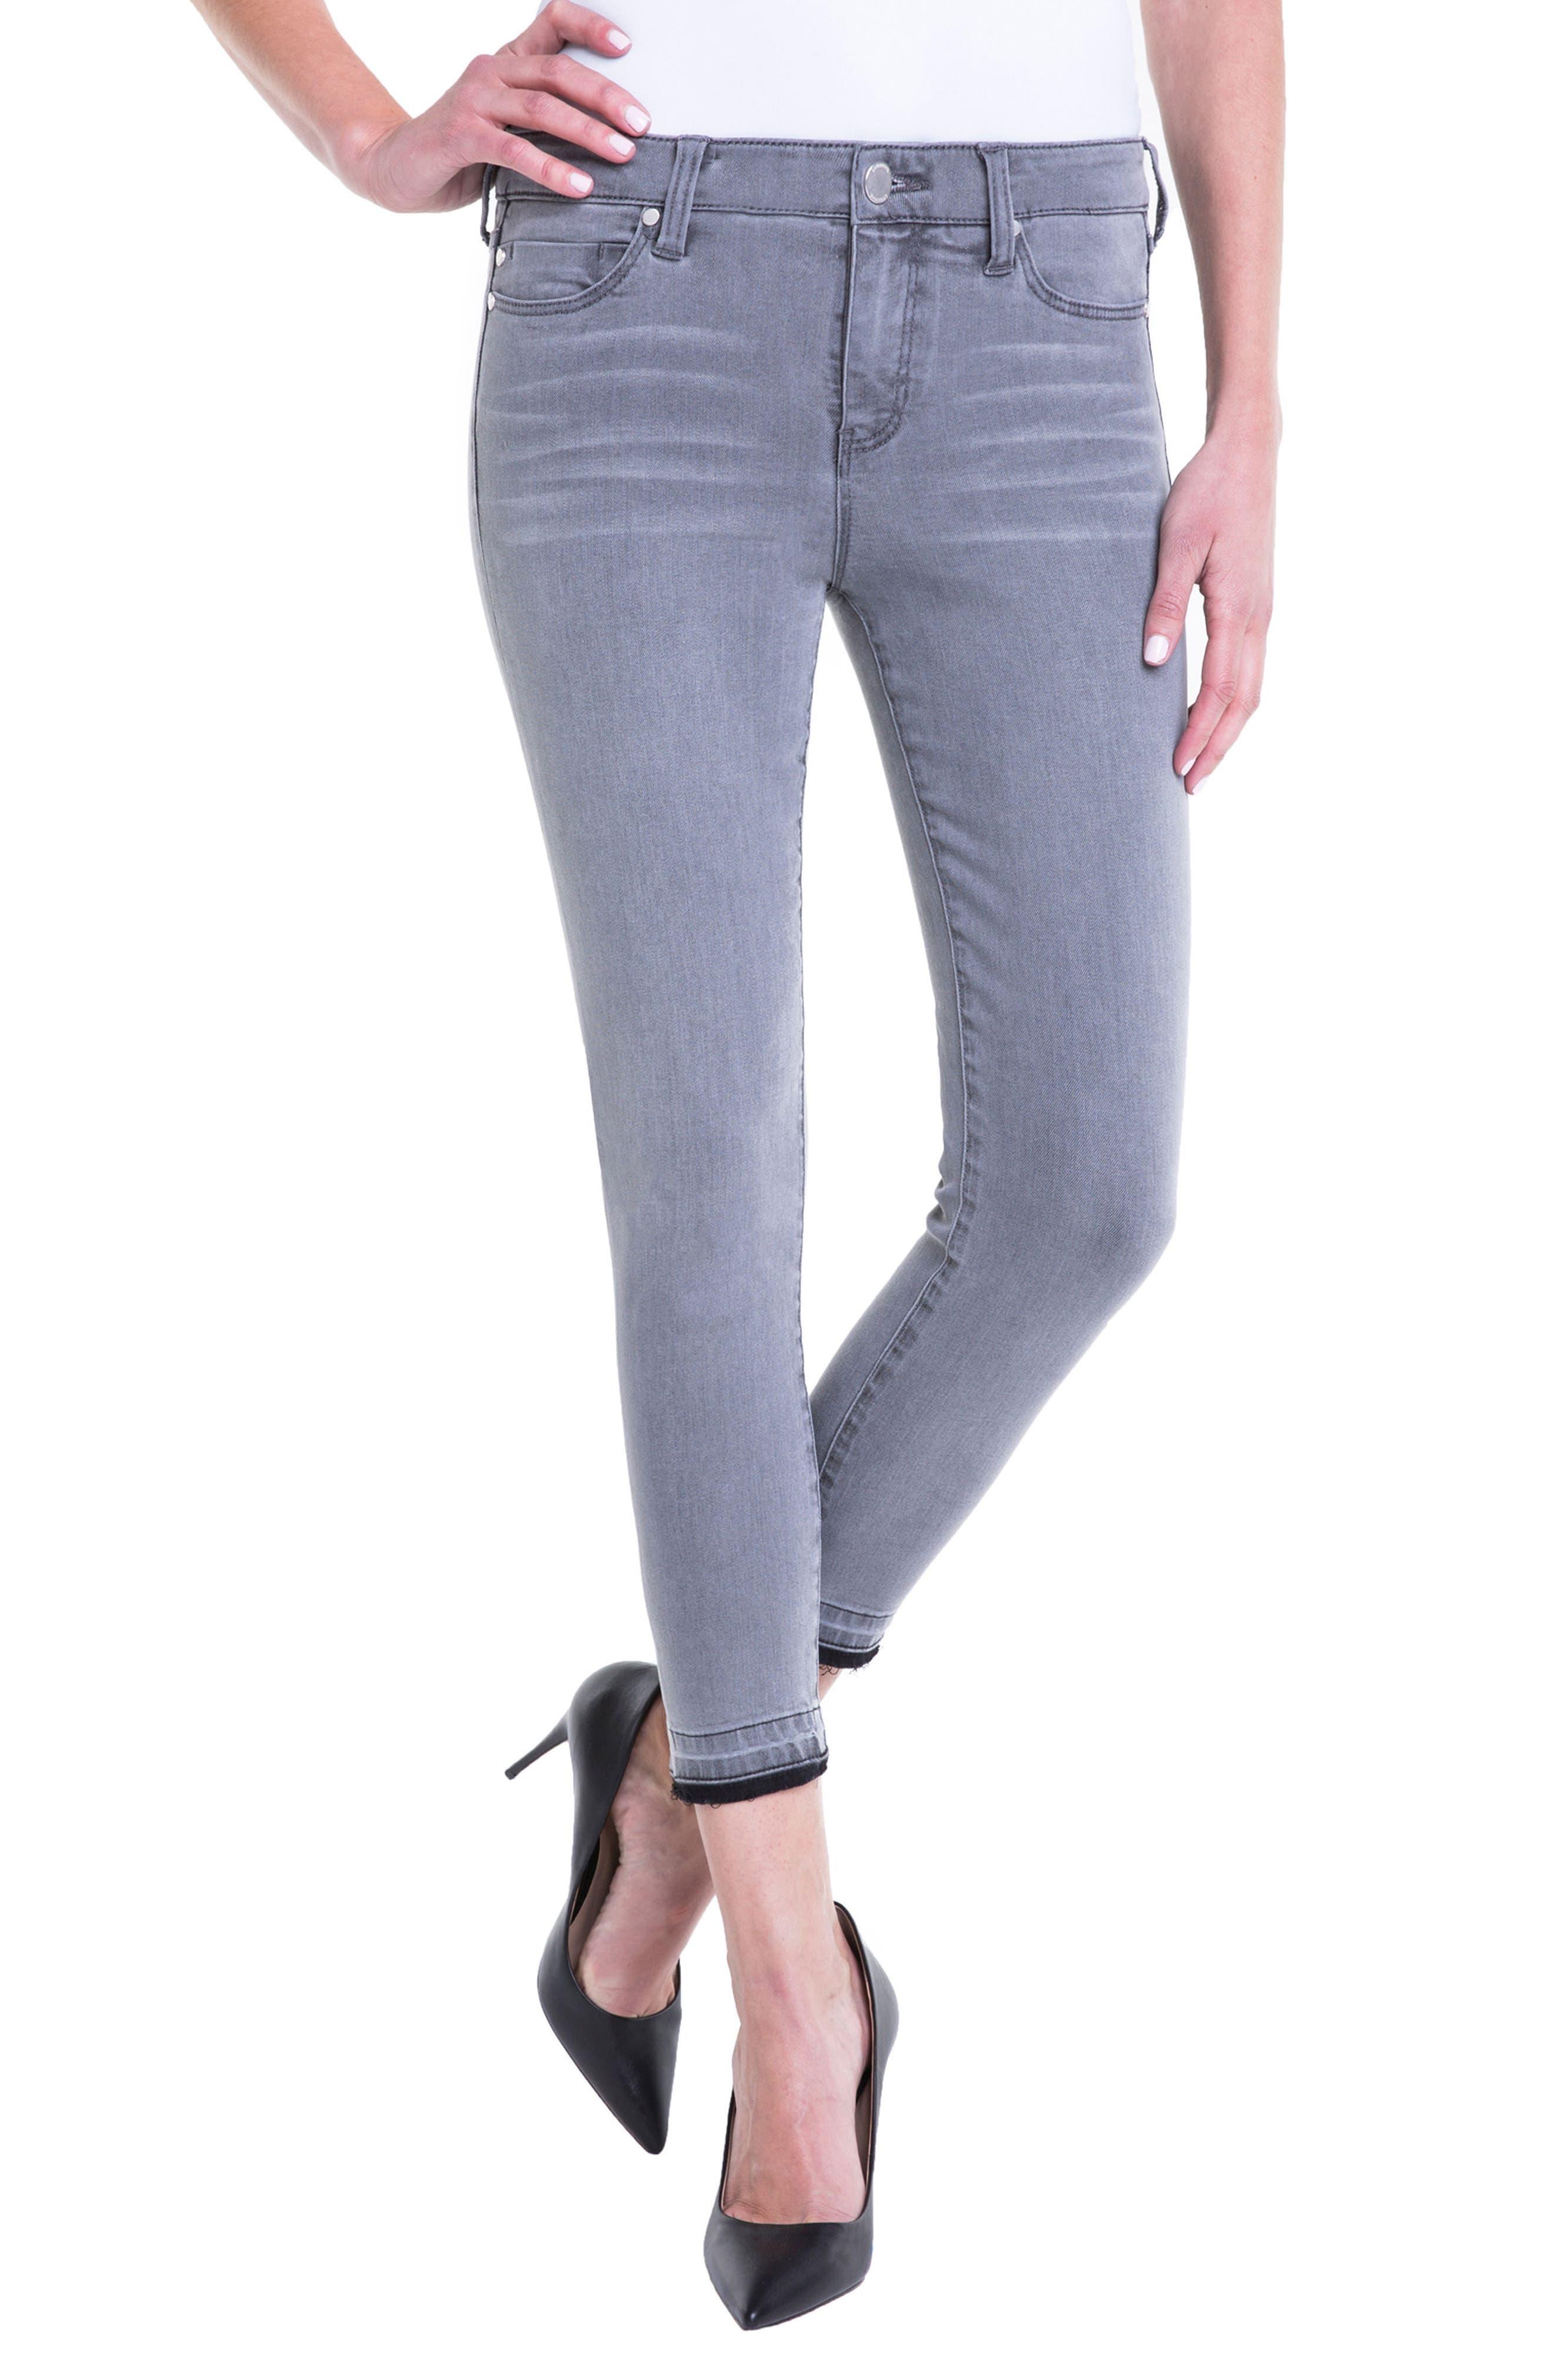 Avery Release Hem Crop Jeans,                             Main thumbnail 1, color,                             Aluminum Wash